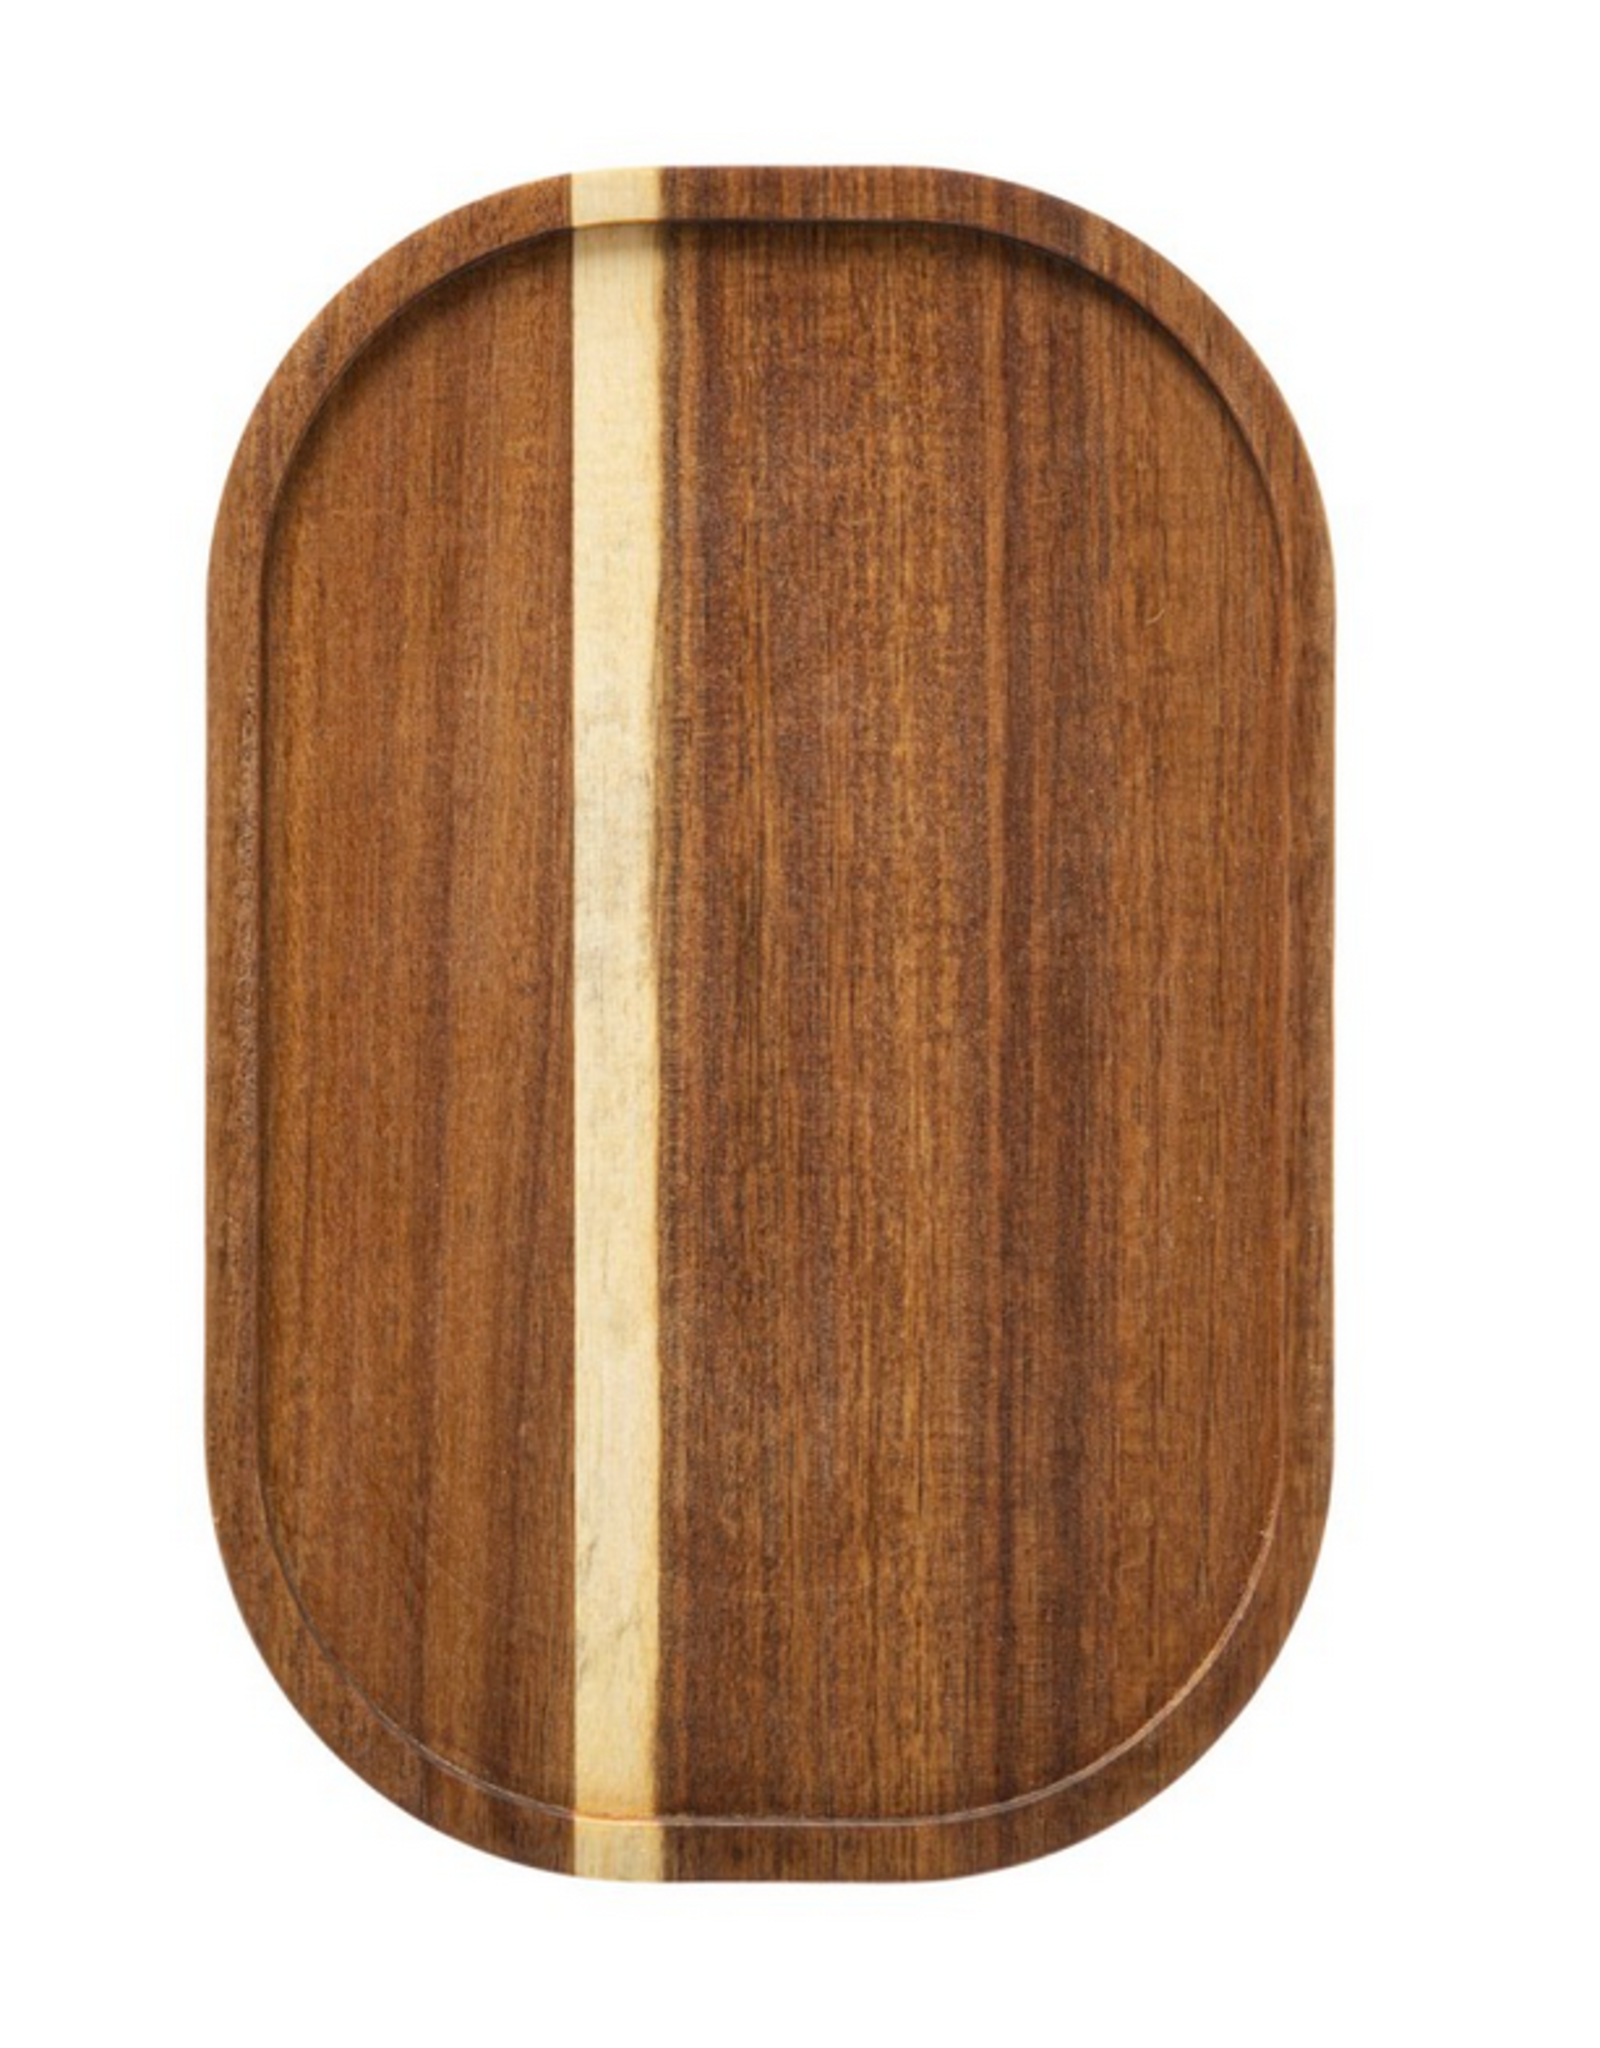 LOFT030 Acacia plank 20 X 30 cm - Bruin/wit